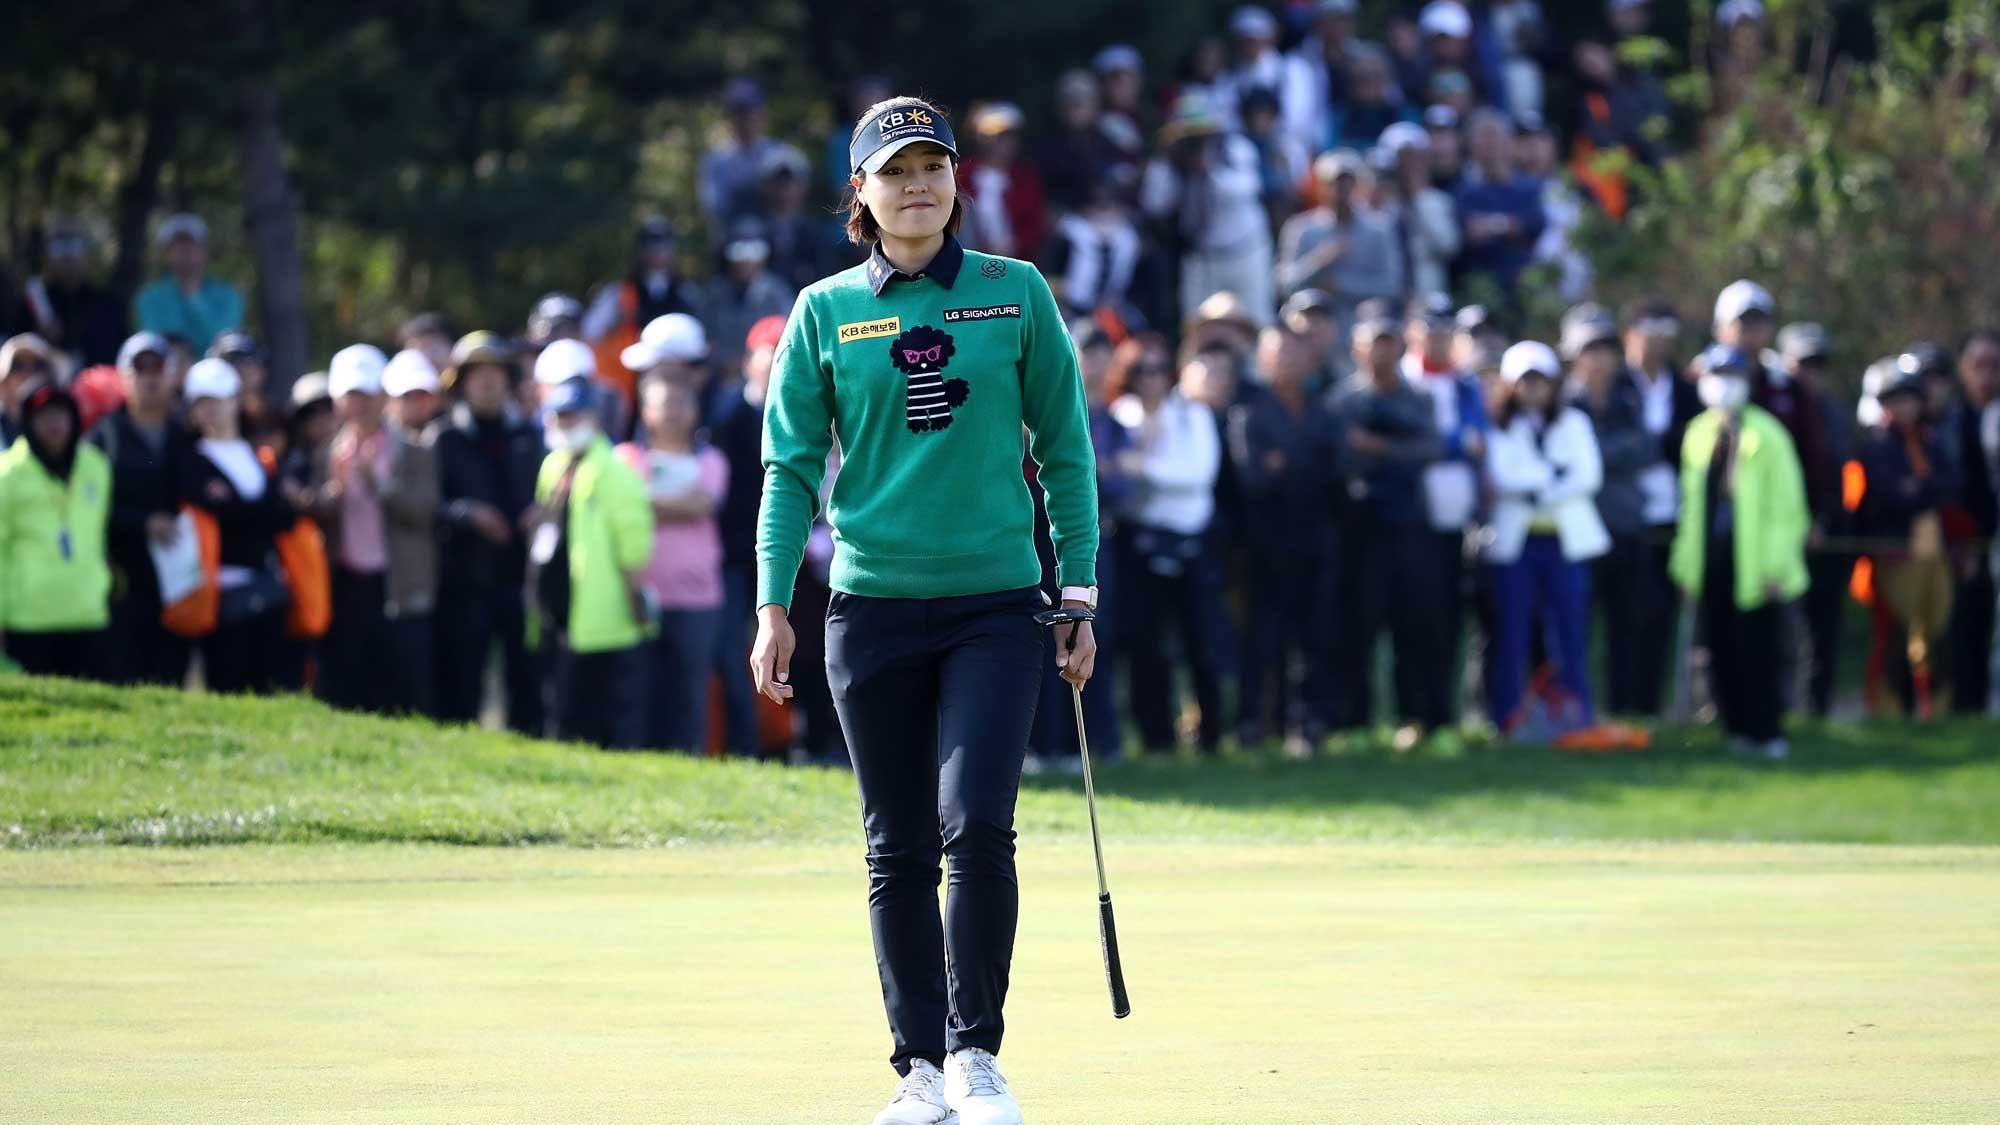 First LPGA title for Chun in two years